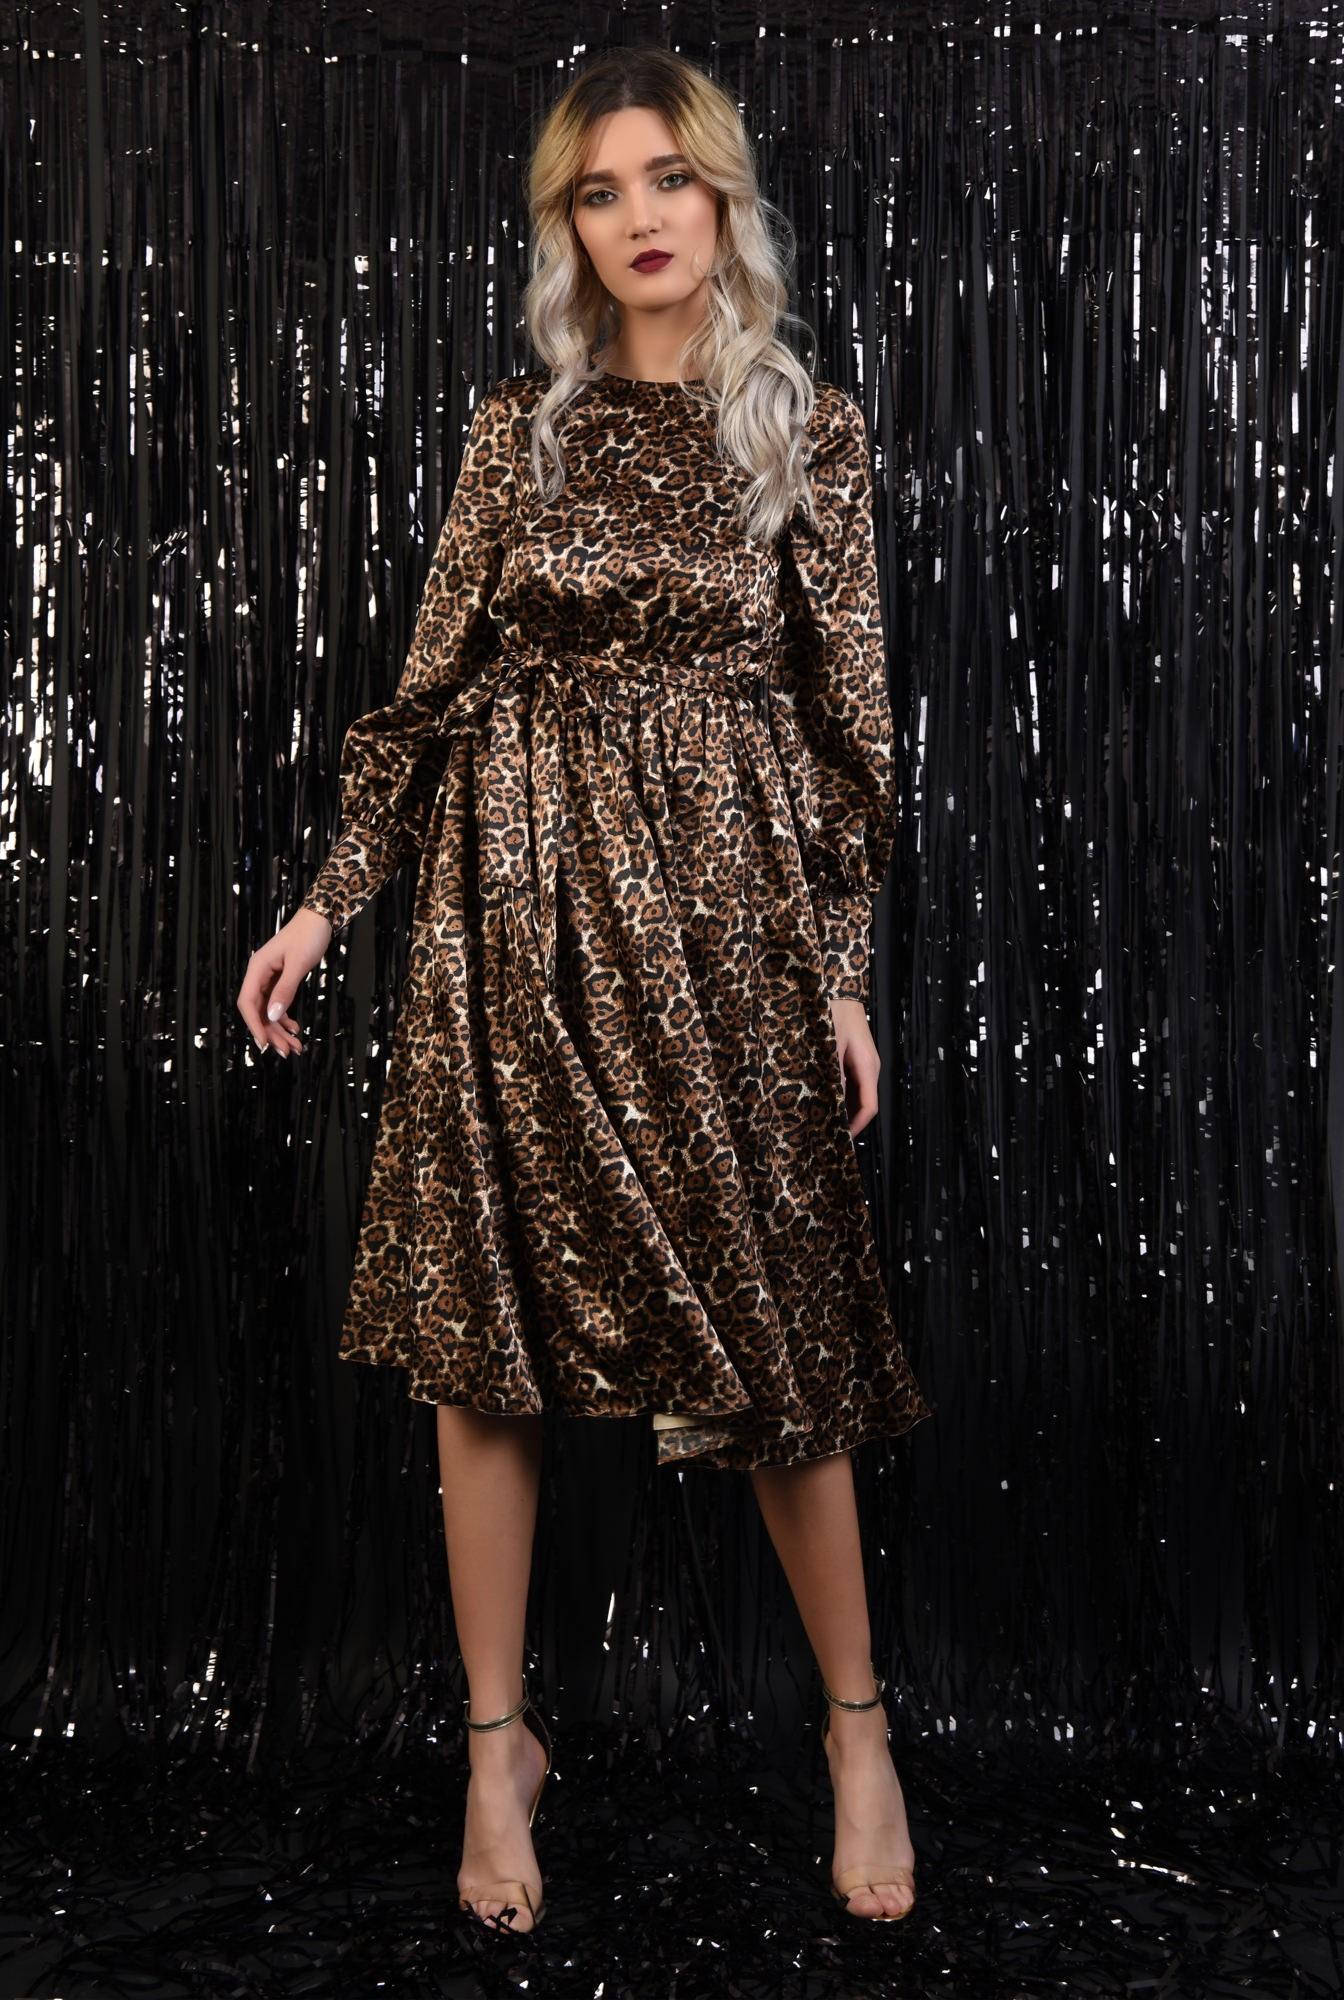 360 - rochie eleganta, din satin, animal print, nasturi la spate, evazata